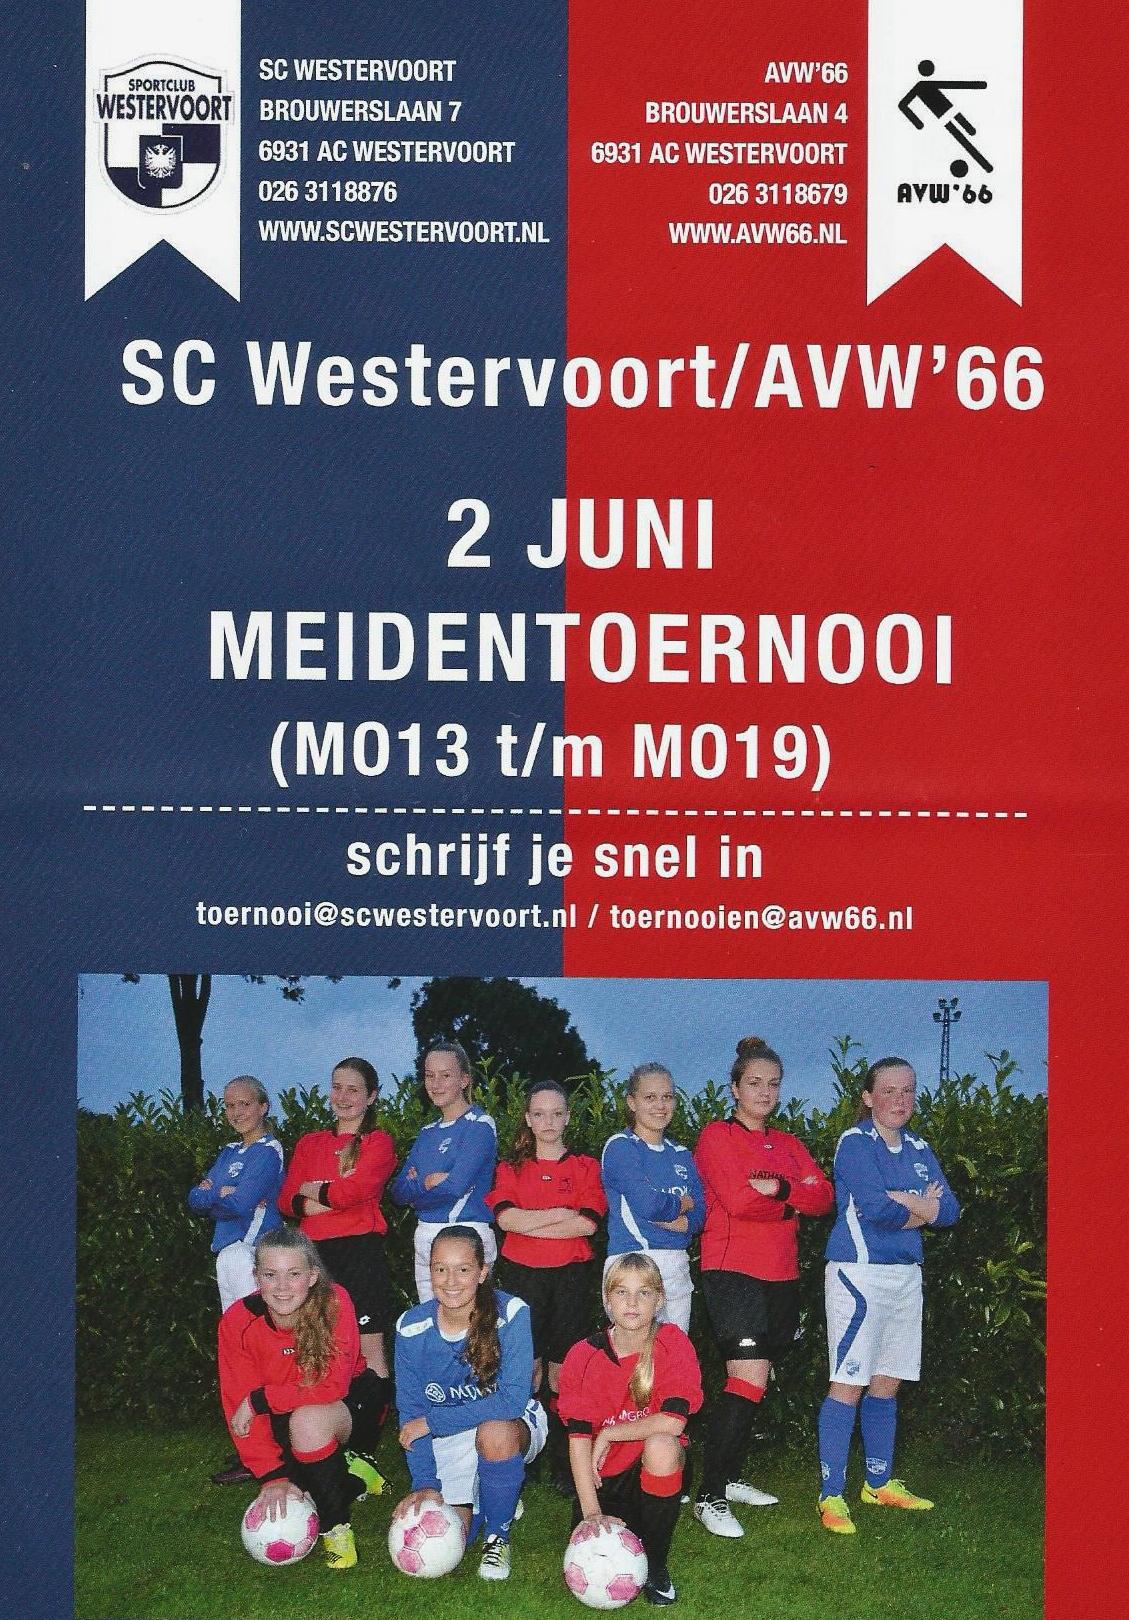 Meiden voetbaltoernooi in Westervoort